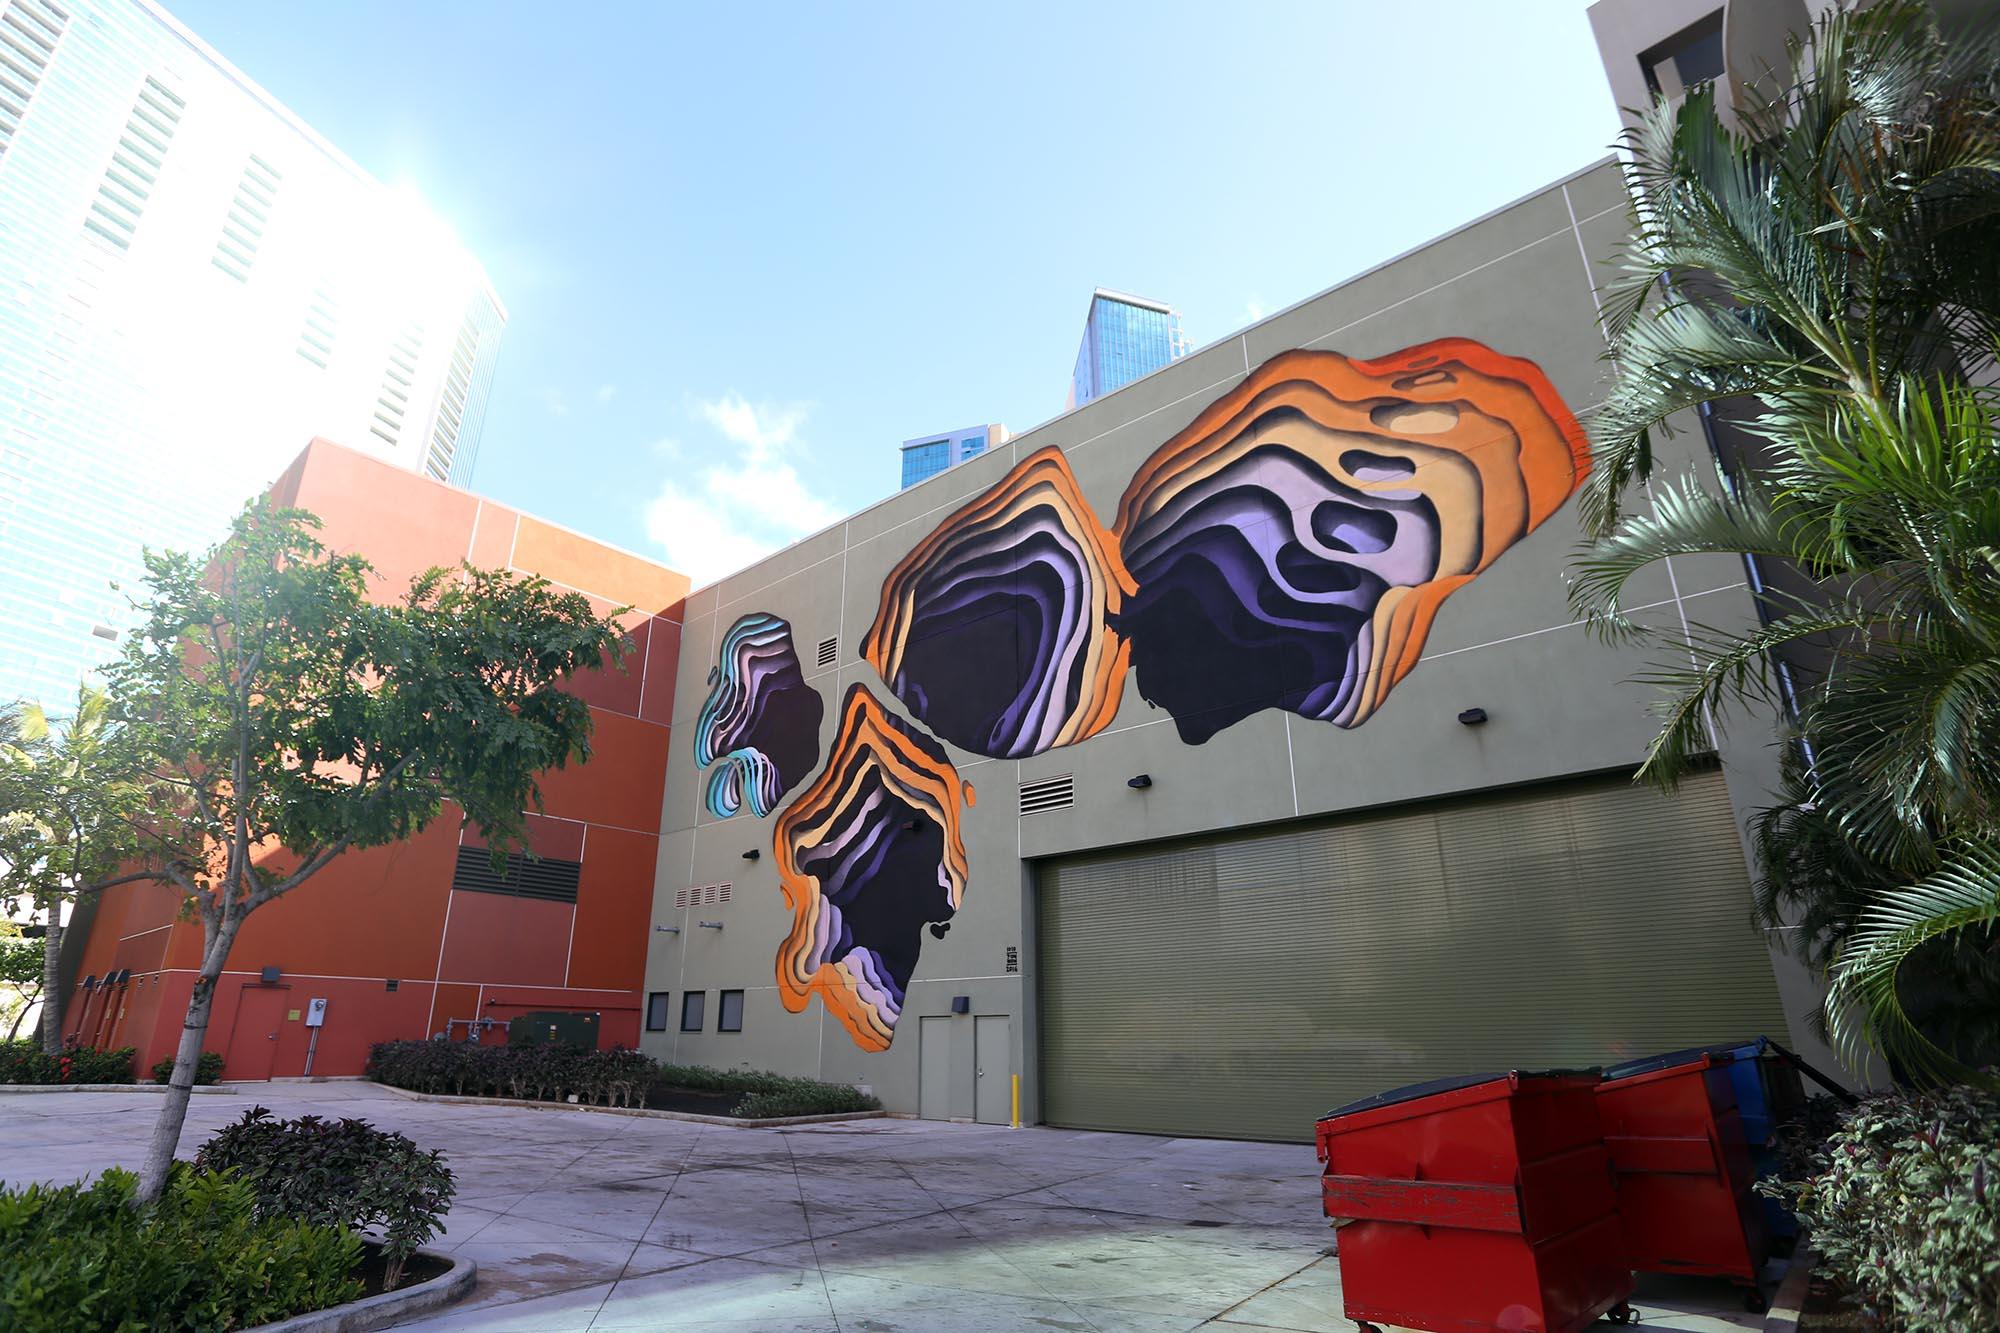 1010-festival-pow-wow-mural-grafite-dionisio-arte (3)